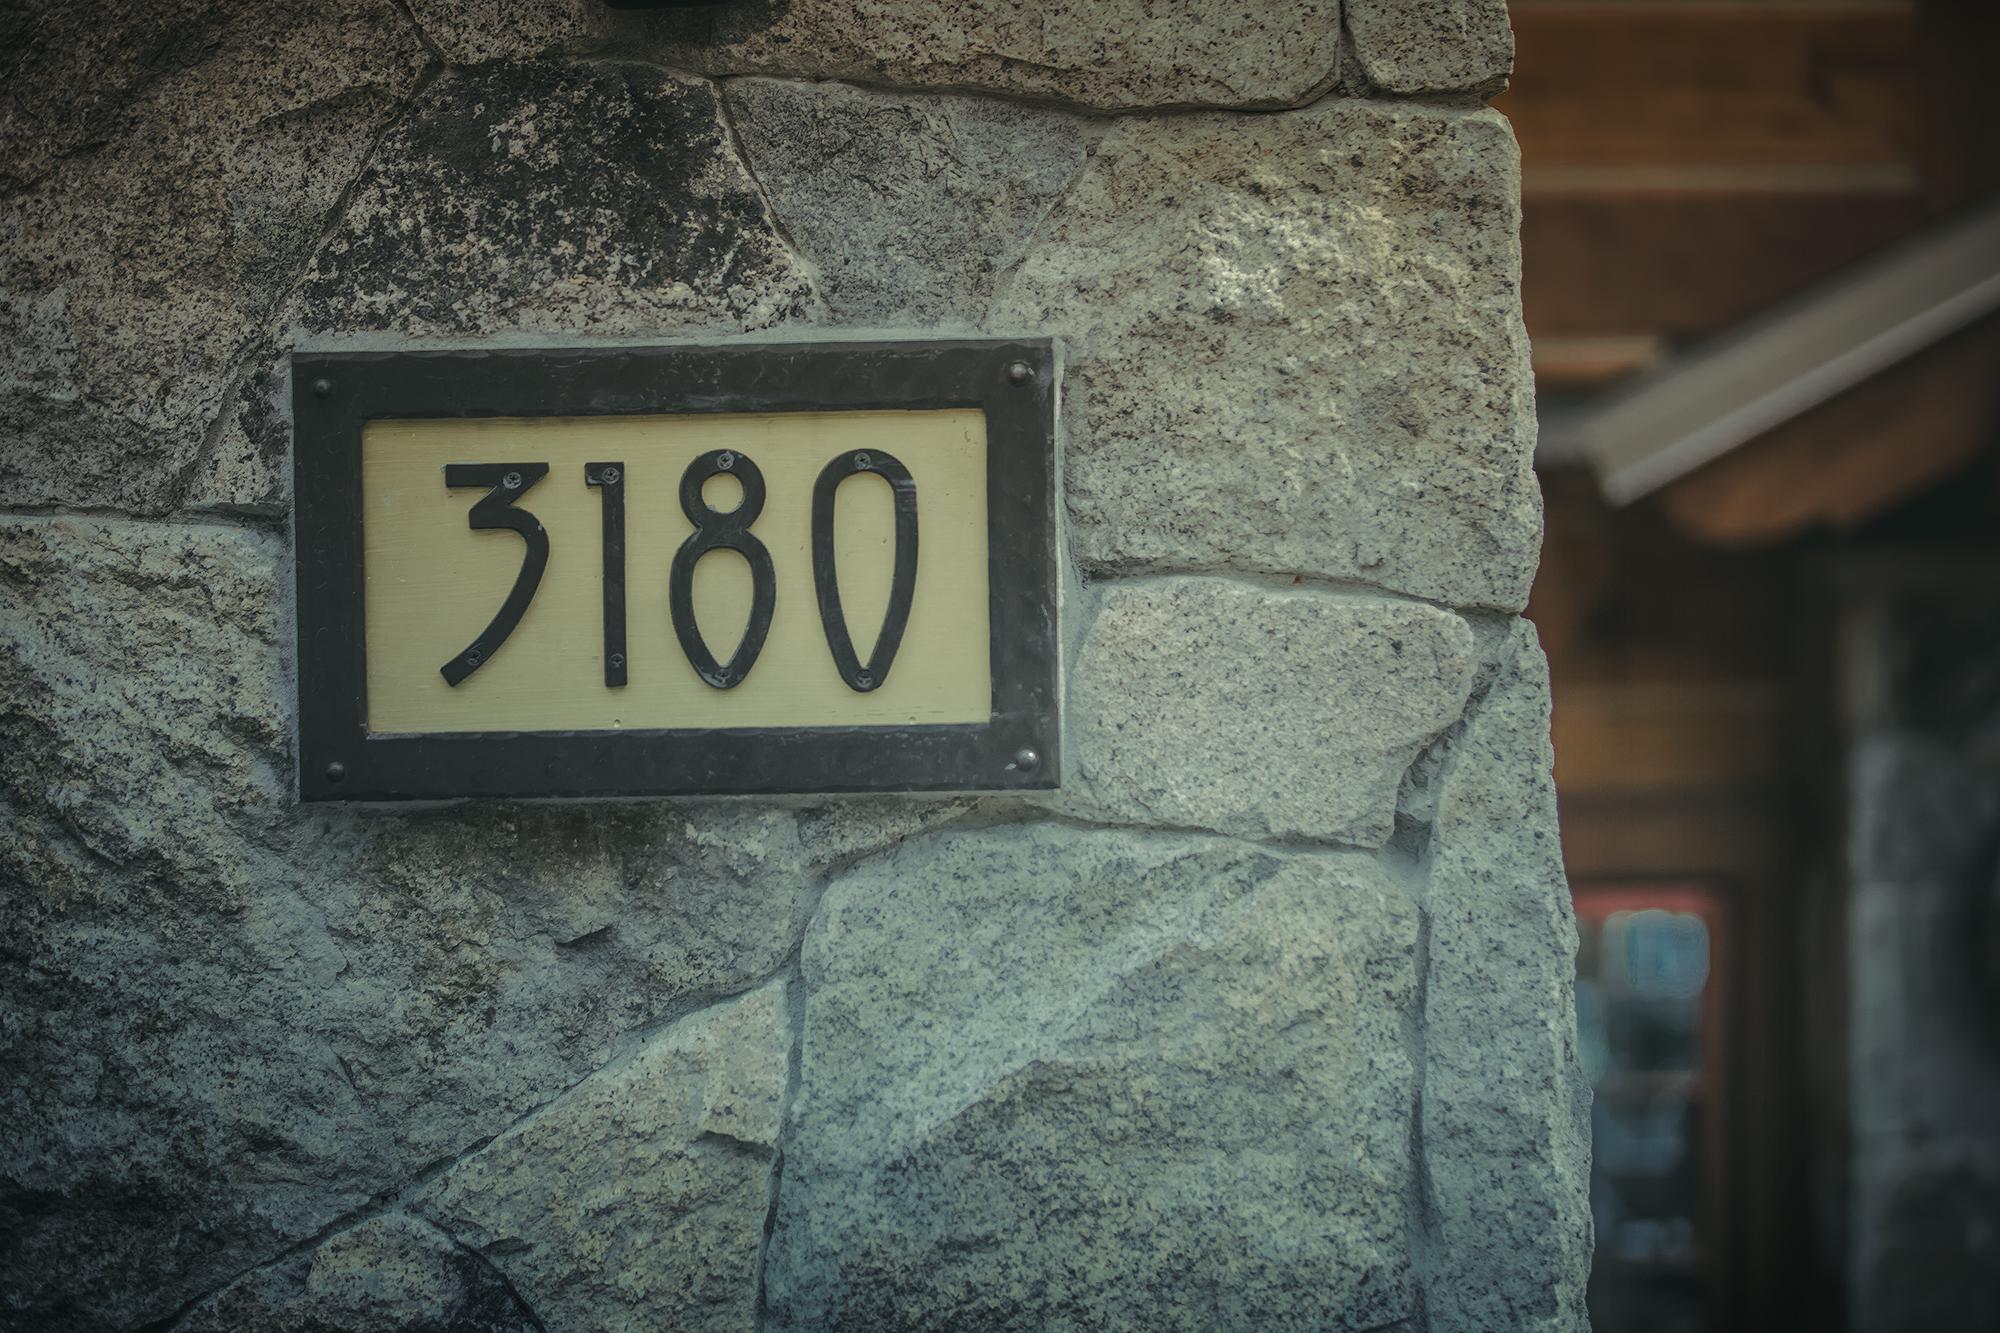 schwab-residence-address.jpg